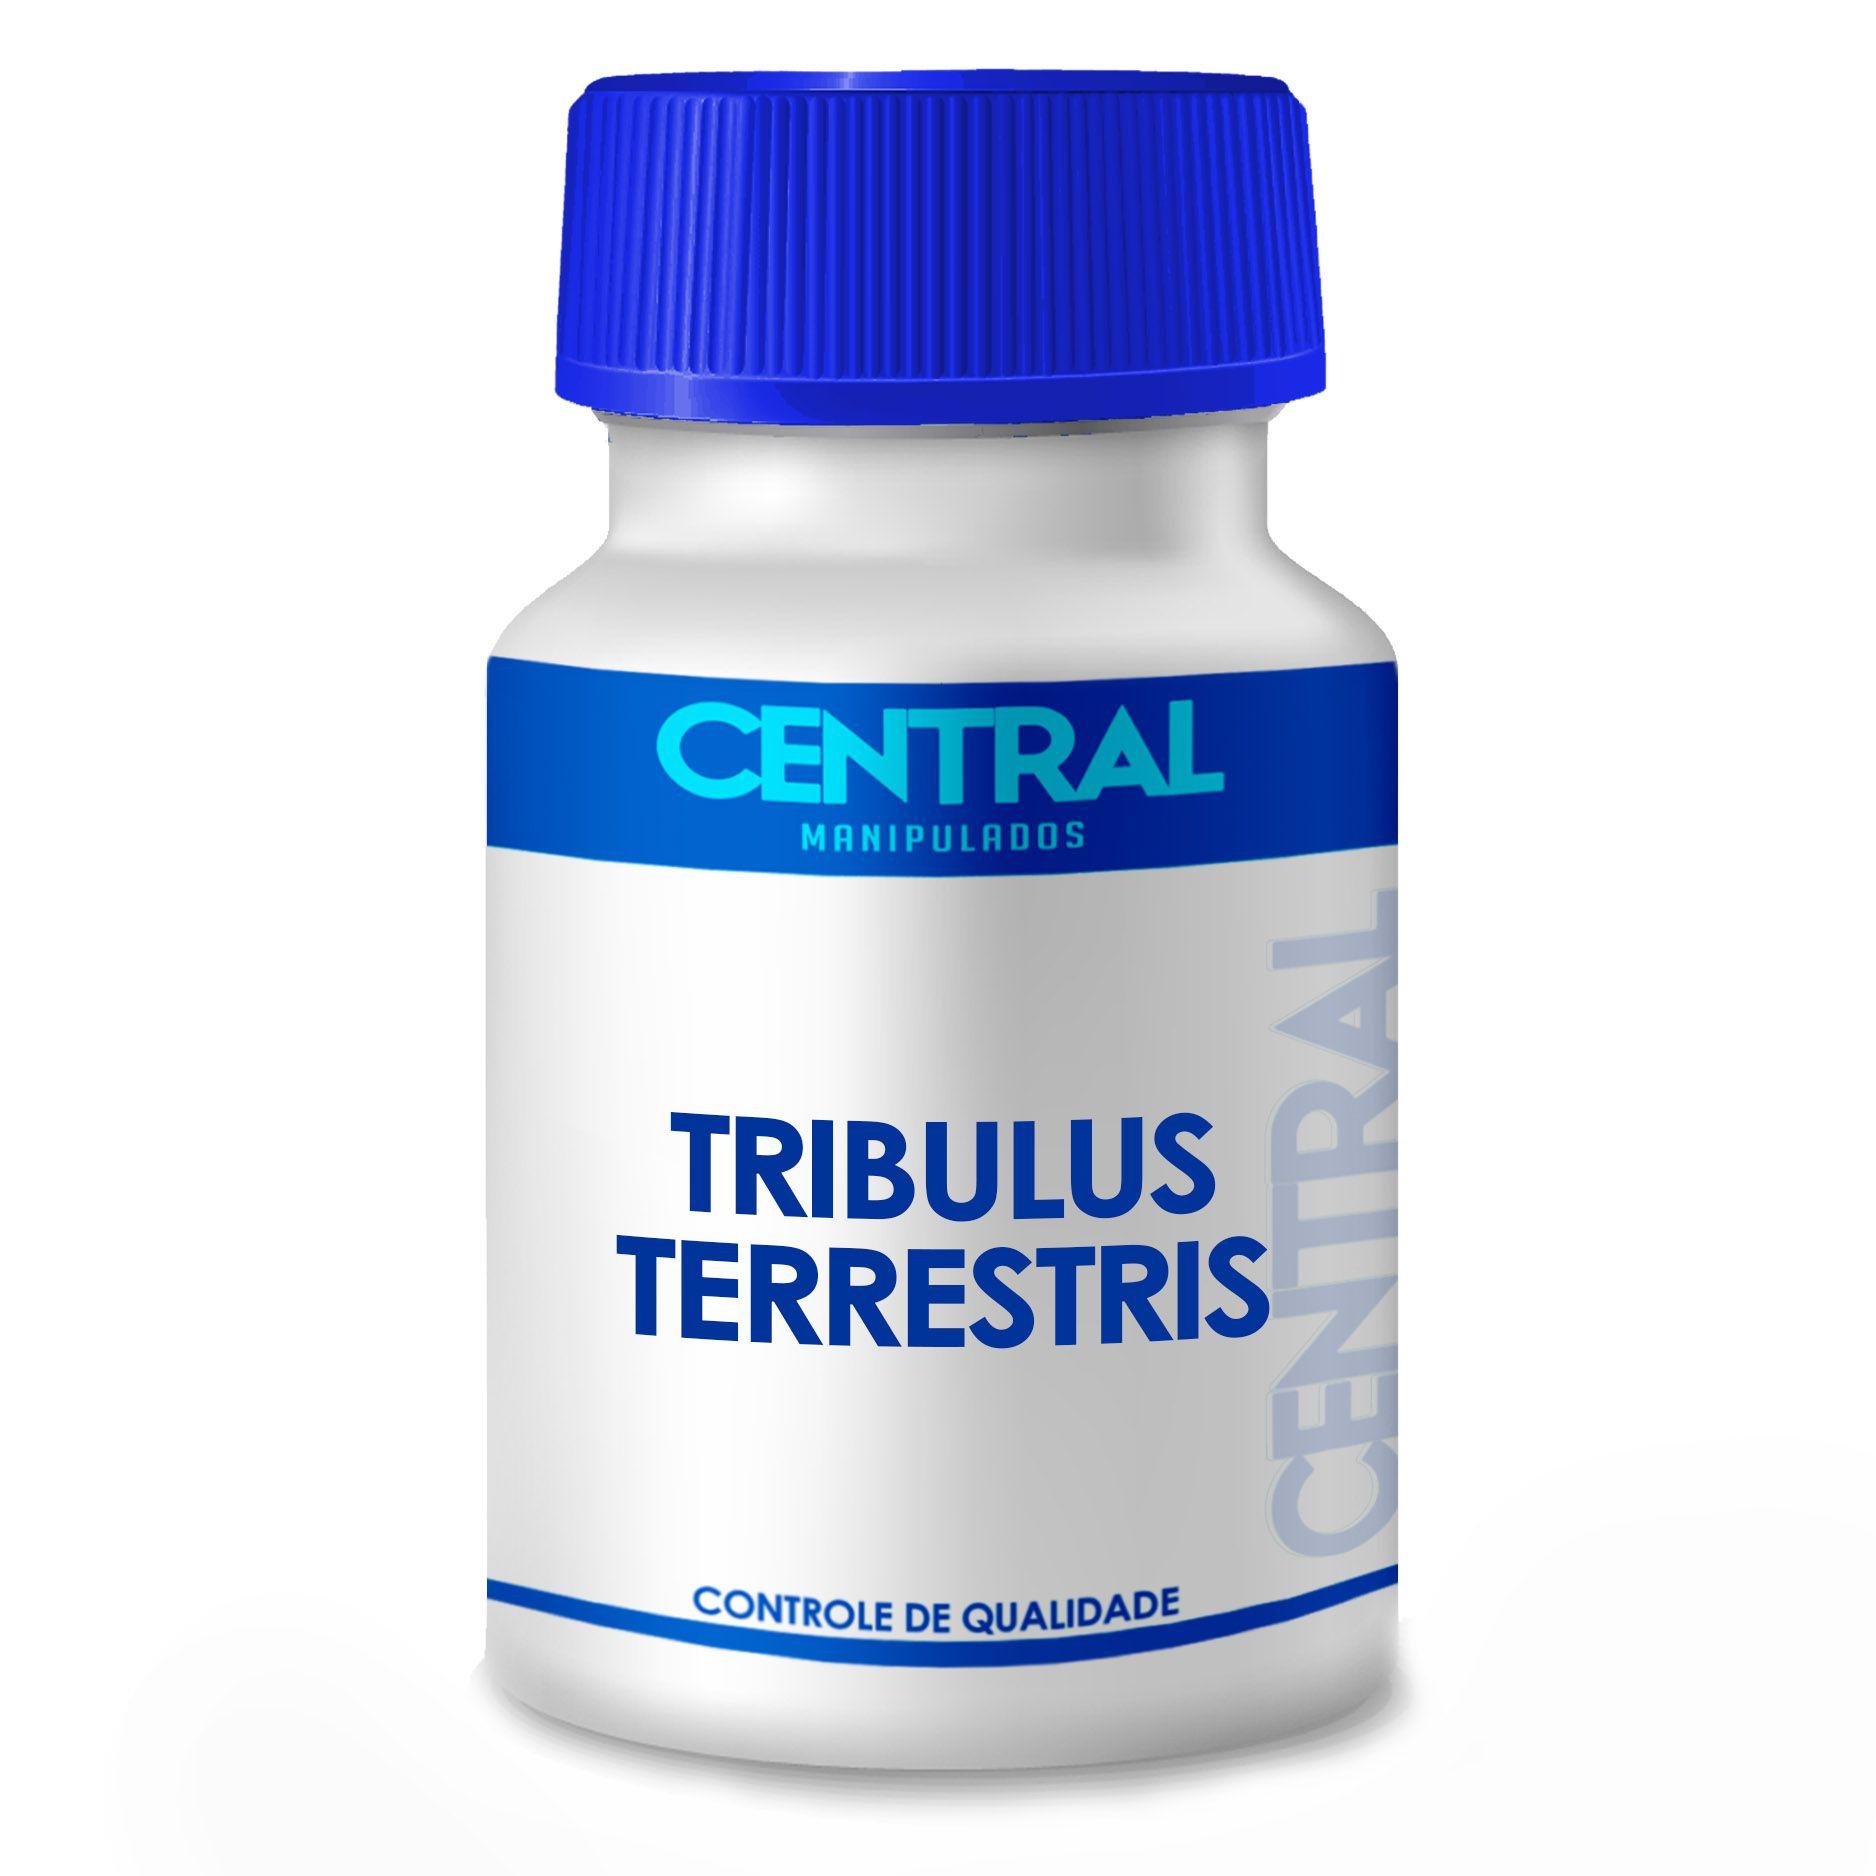 Tribulus Terrestris 500mg 60 cápsulas